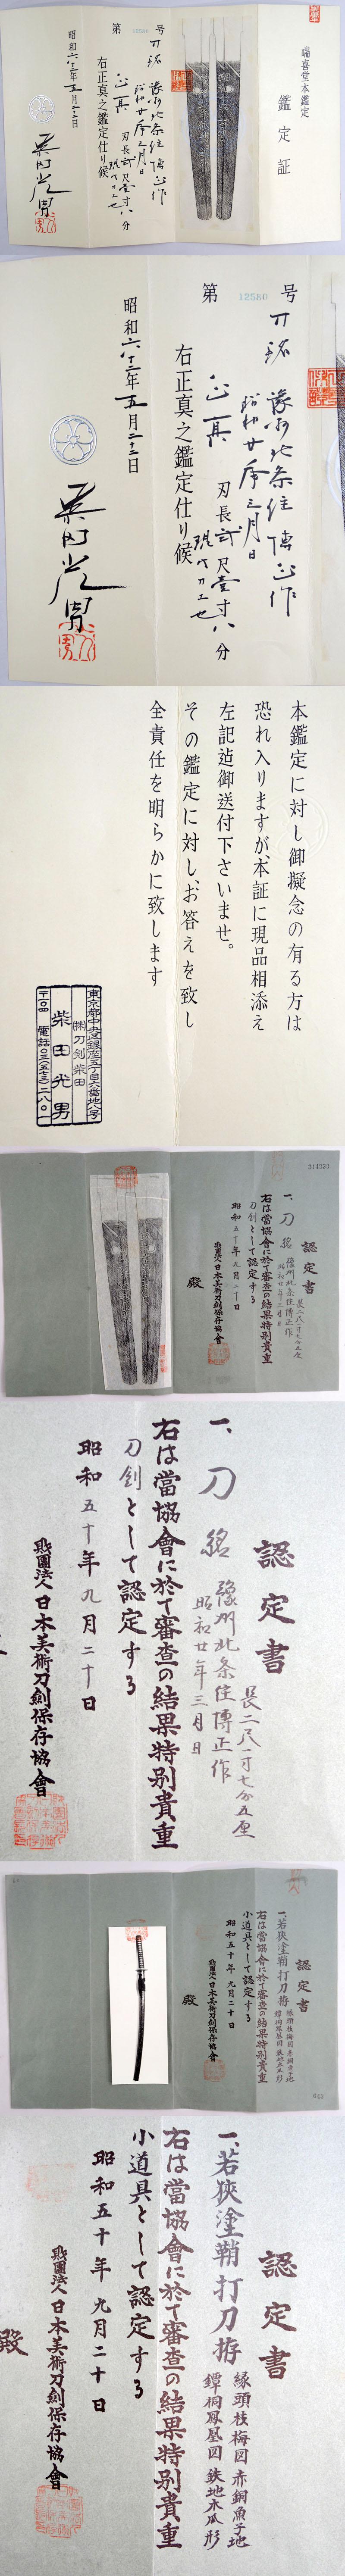 豫州北条住博正作 Picture of Certificate